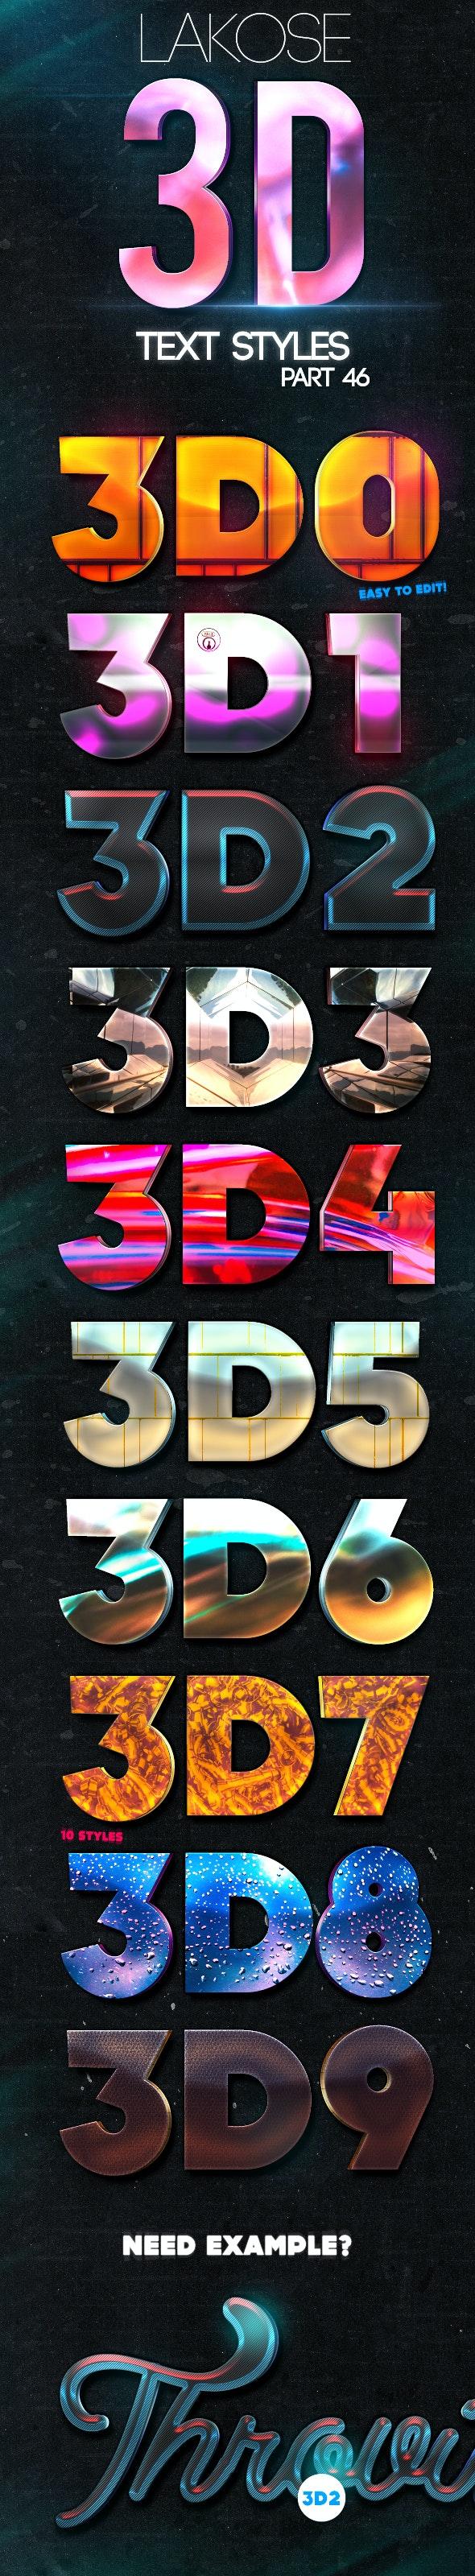 Lakose 3D Text Styles Part 46 - Text Effects Styles